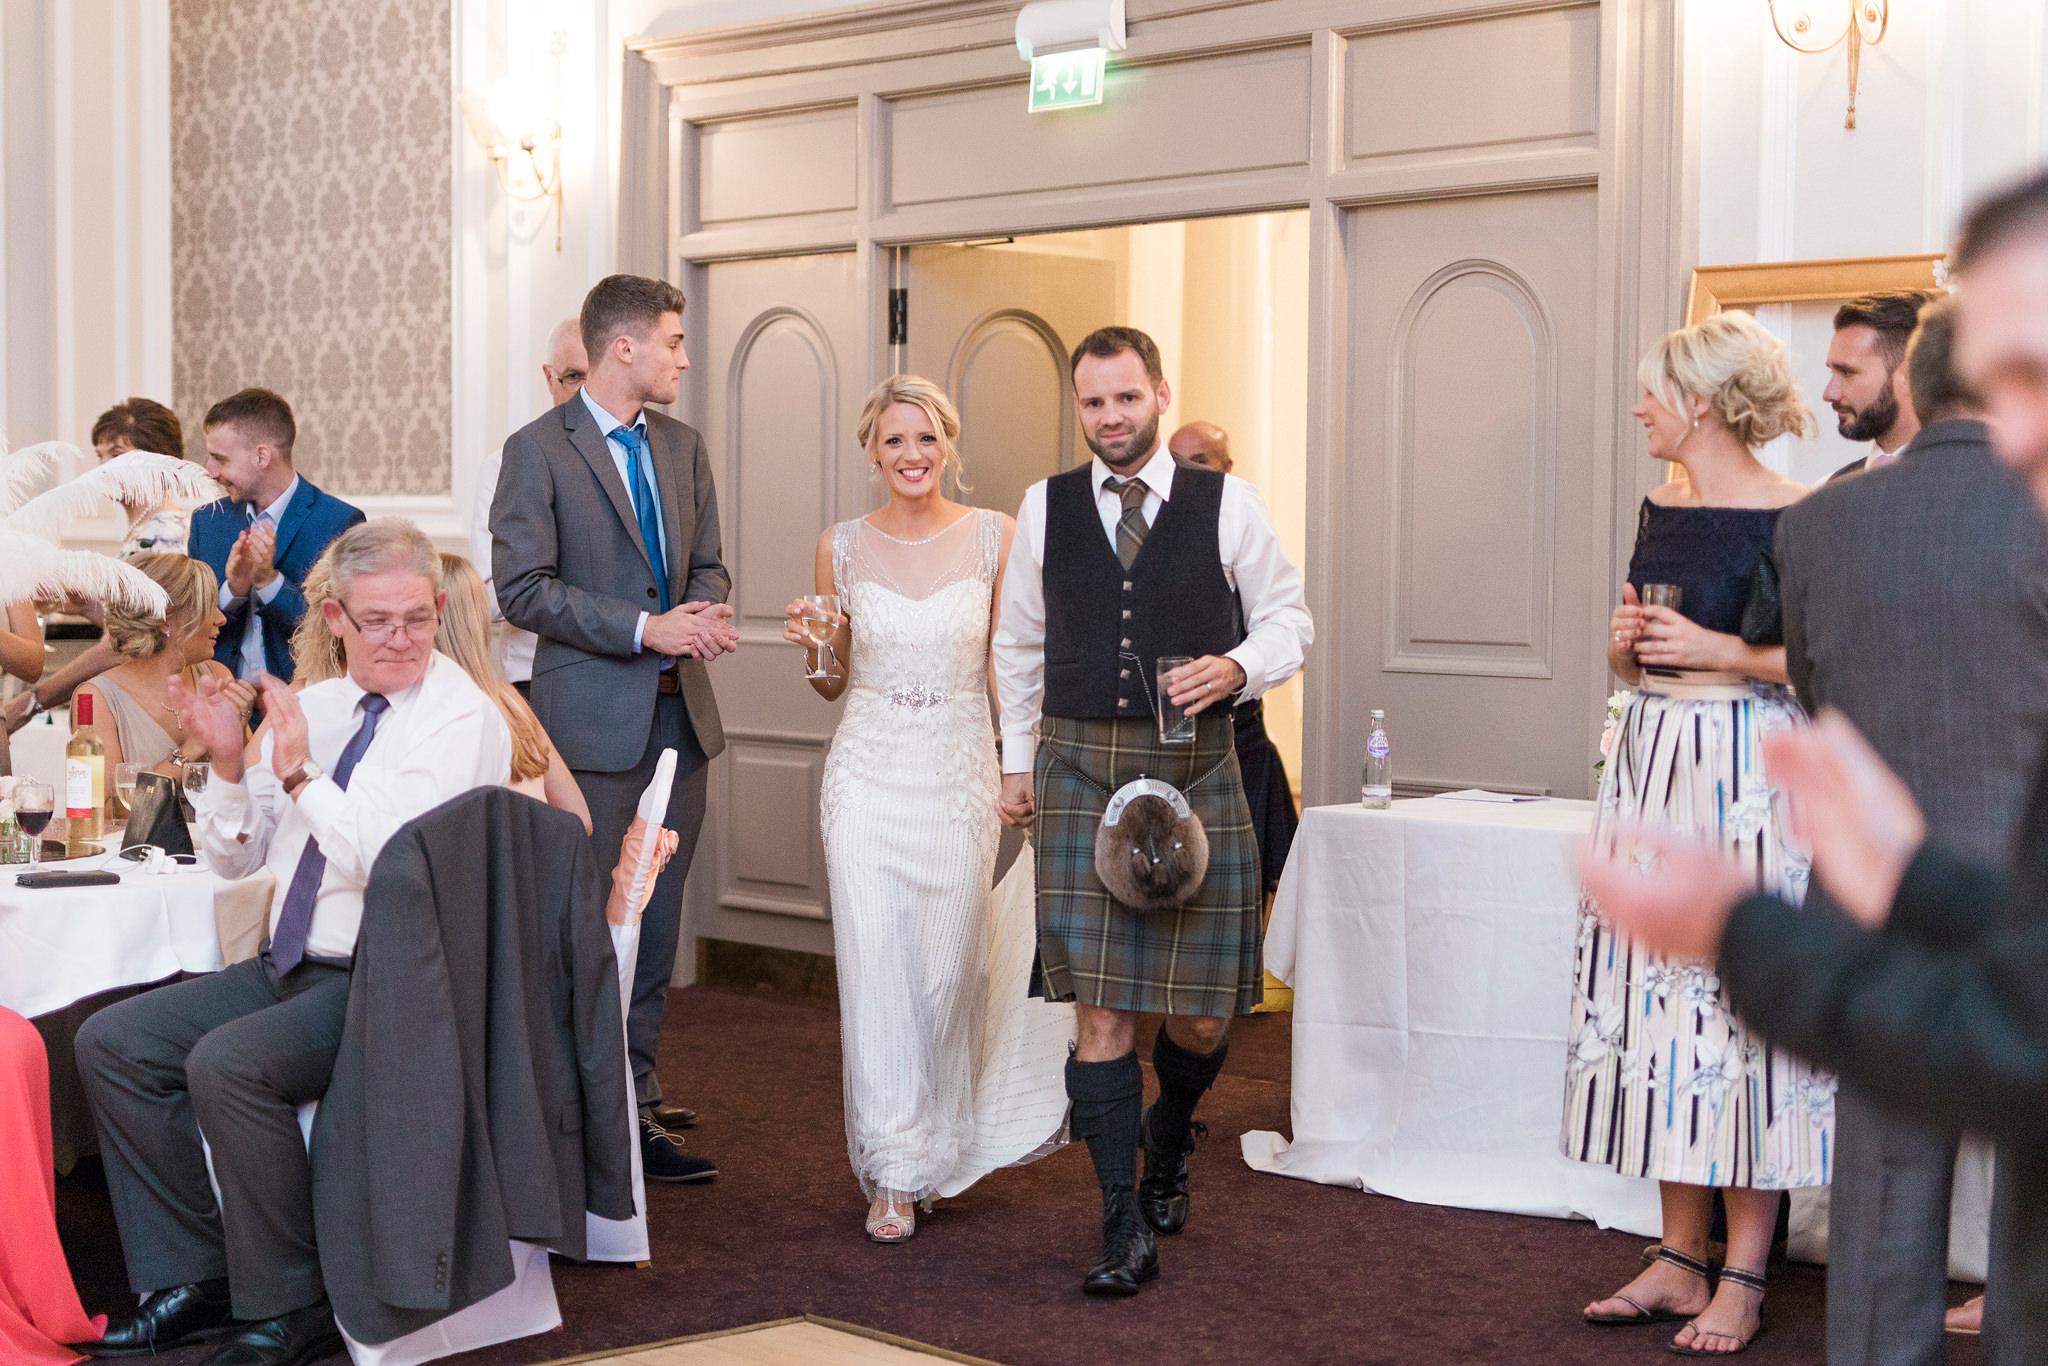 114-destination-wedding-photography.jpg